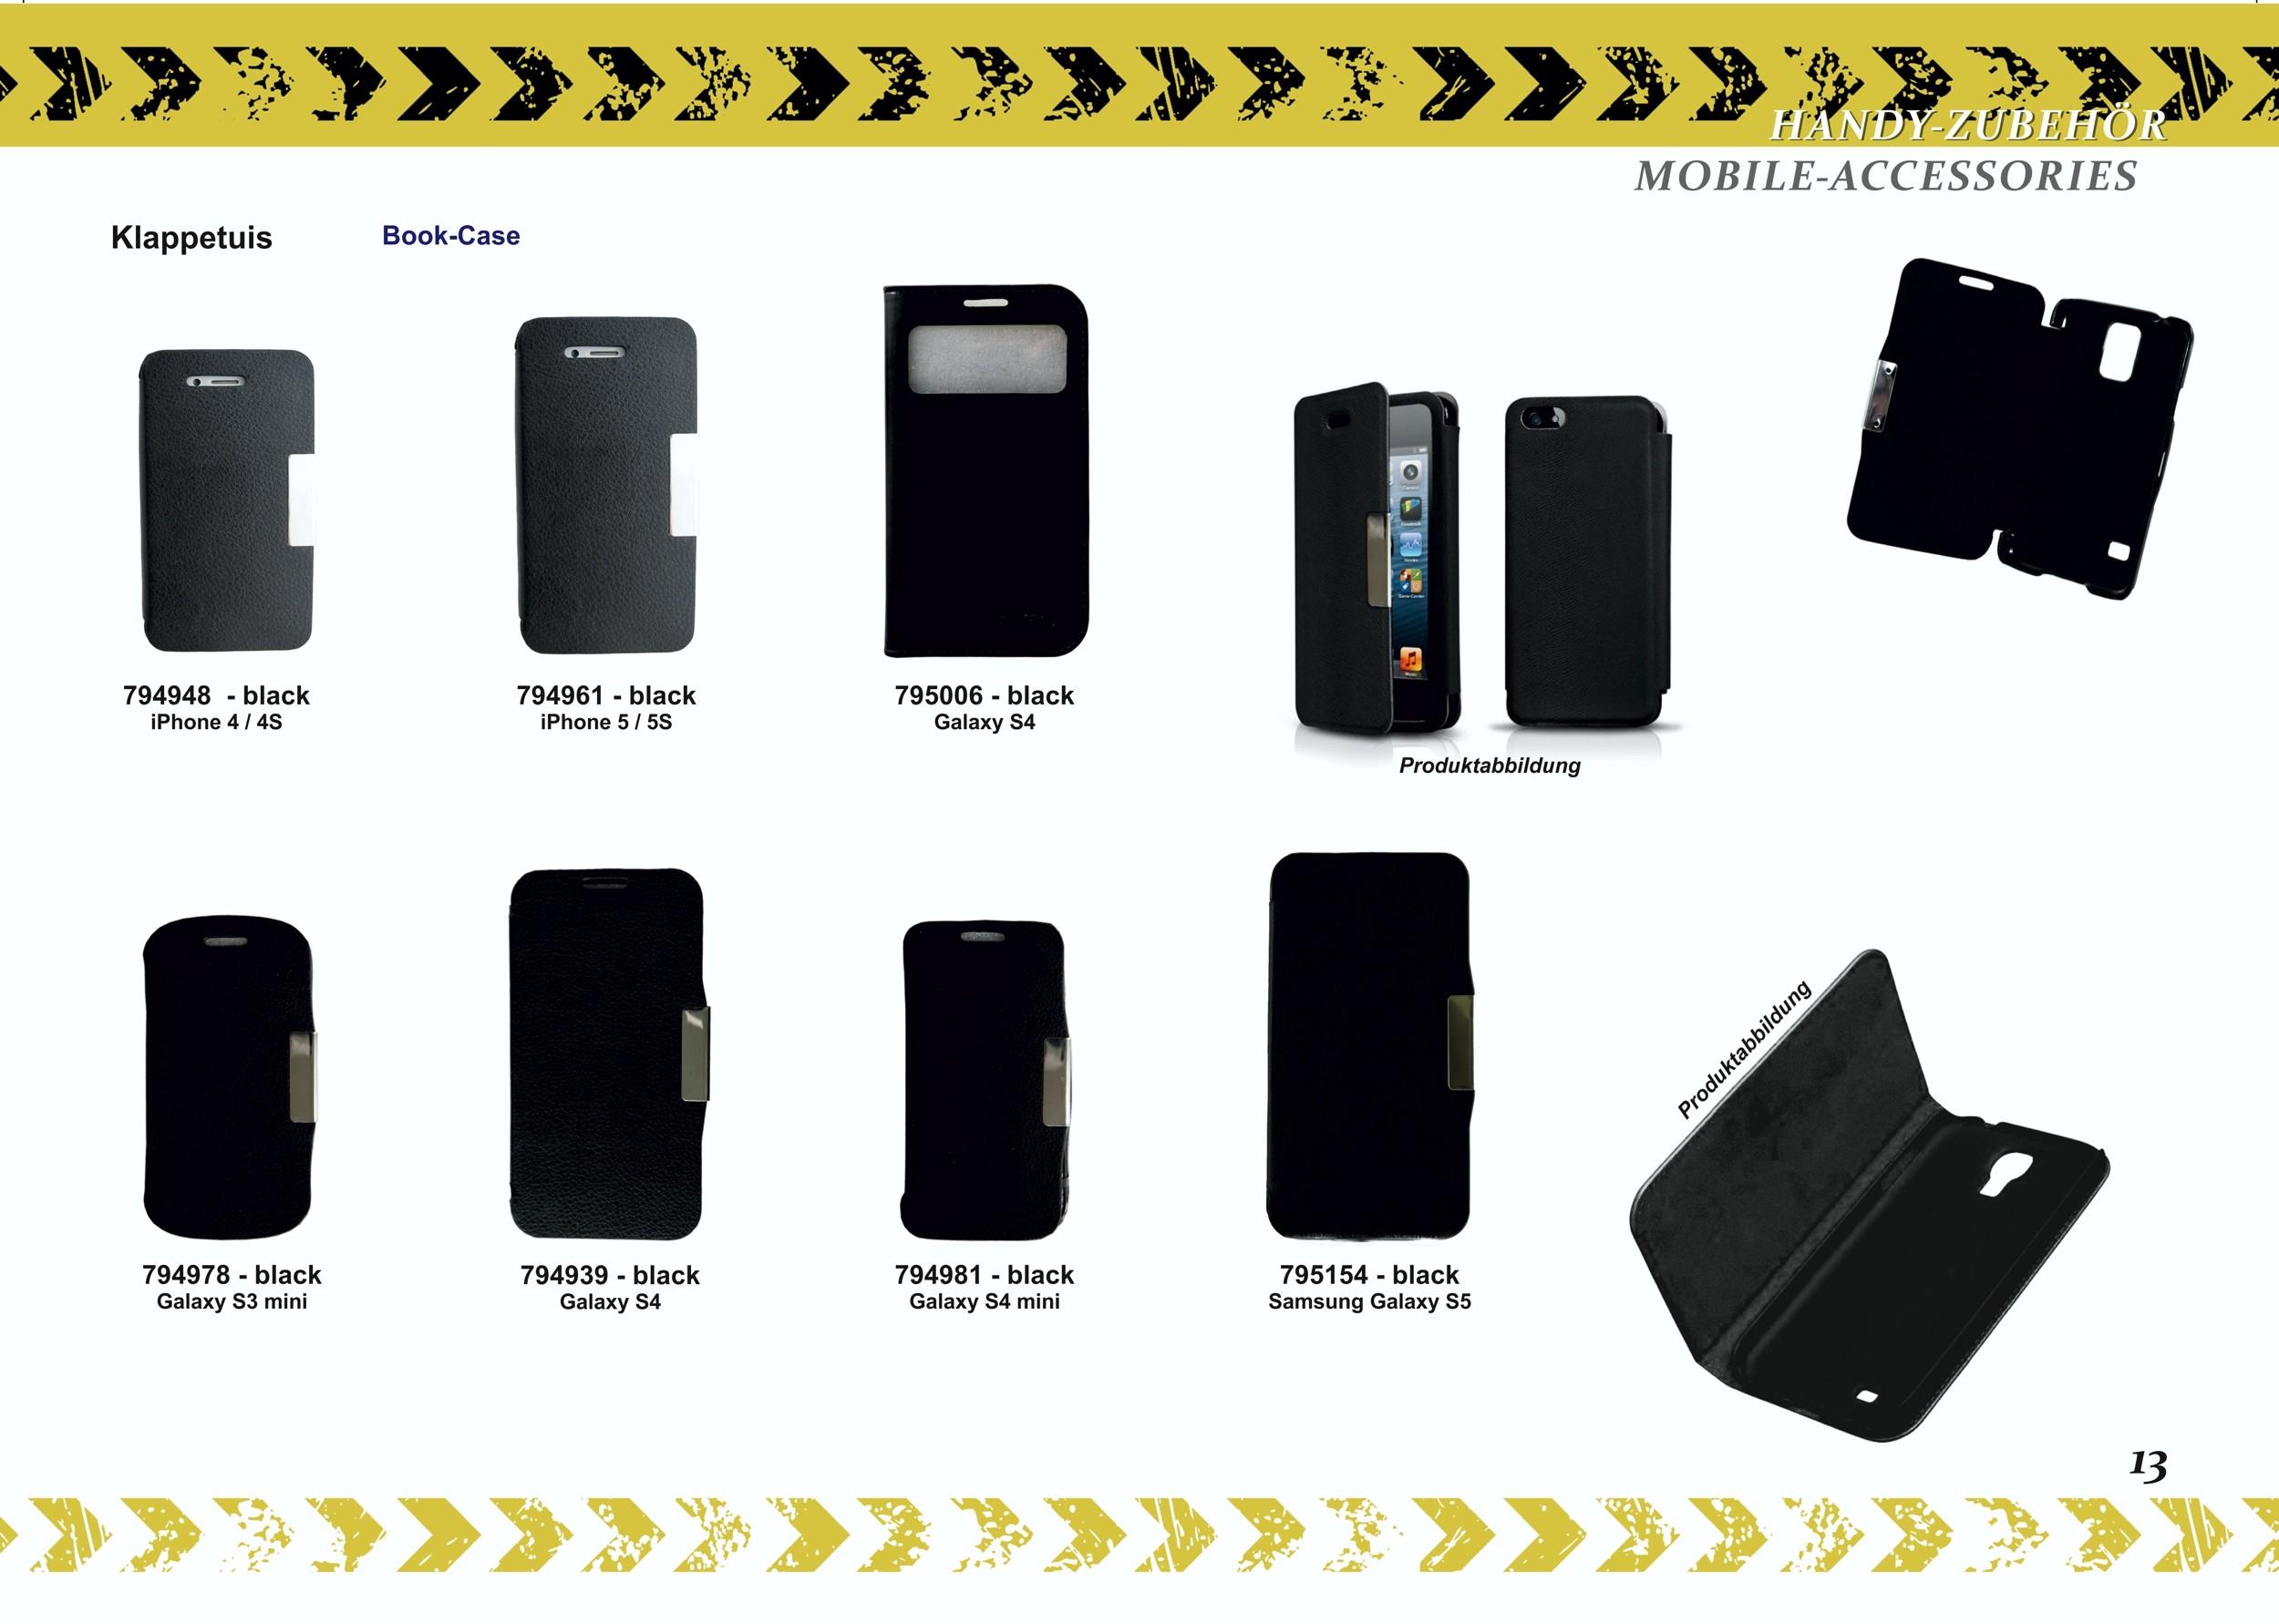 2GO Flip-Case for Samsung Galaxy S5 mini leather – Bild 5